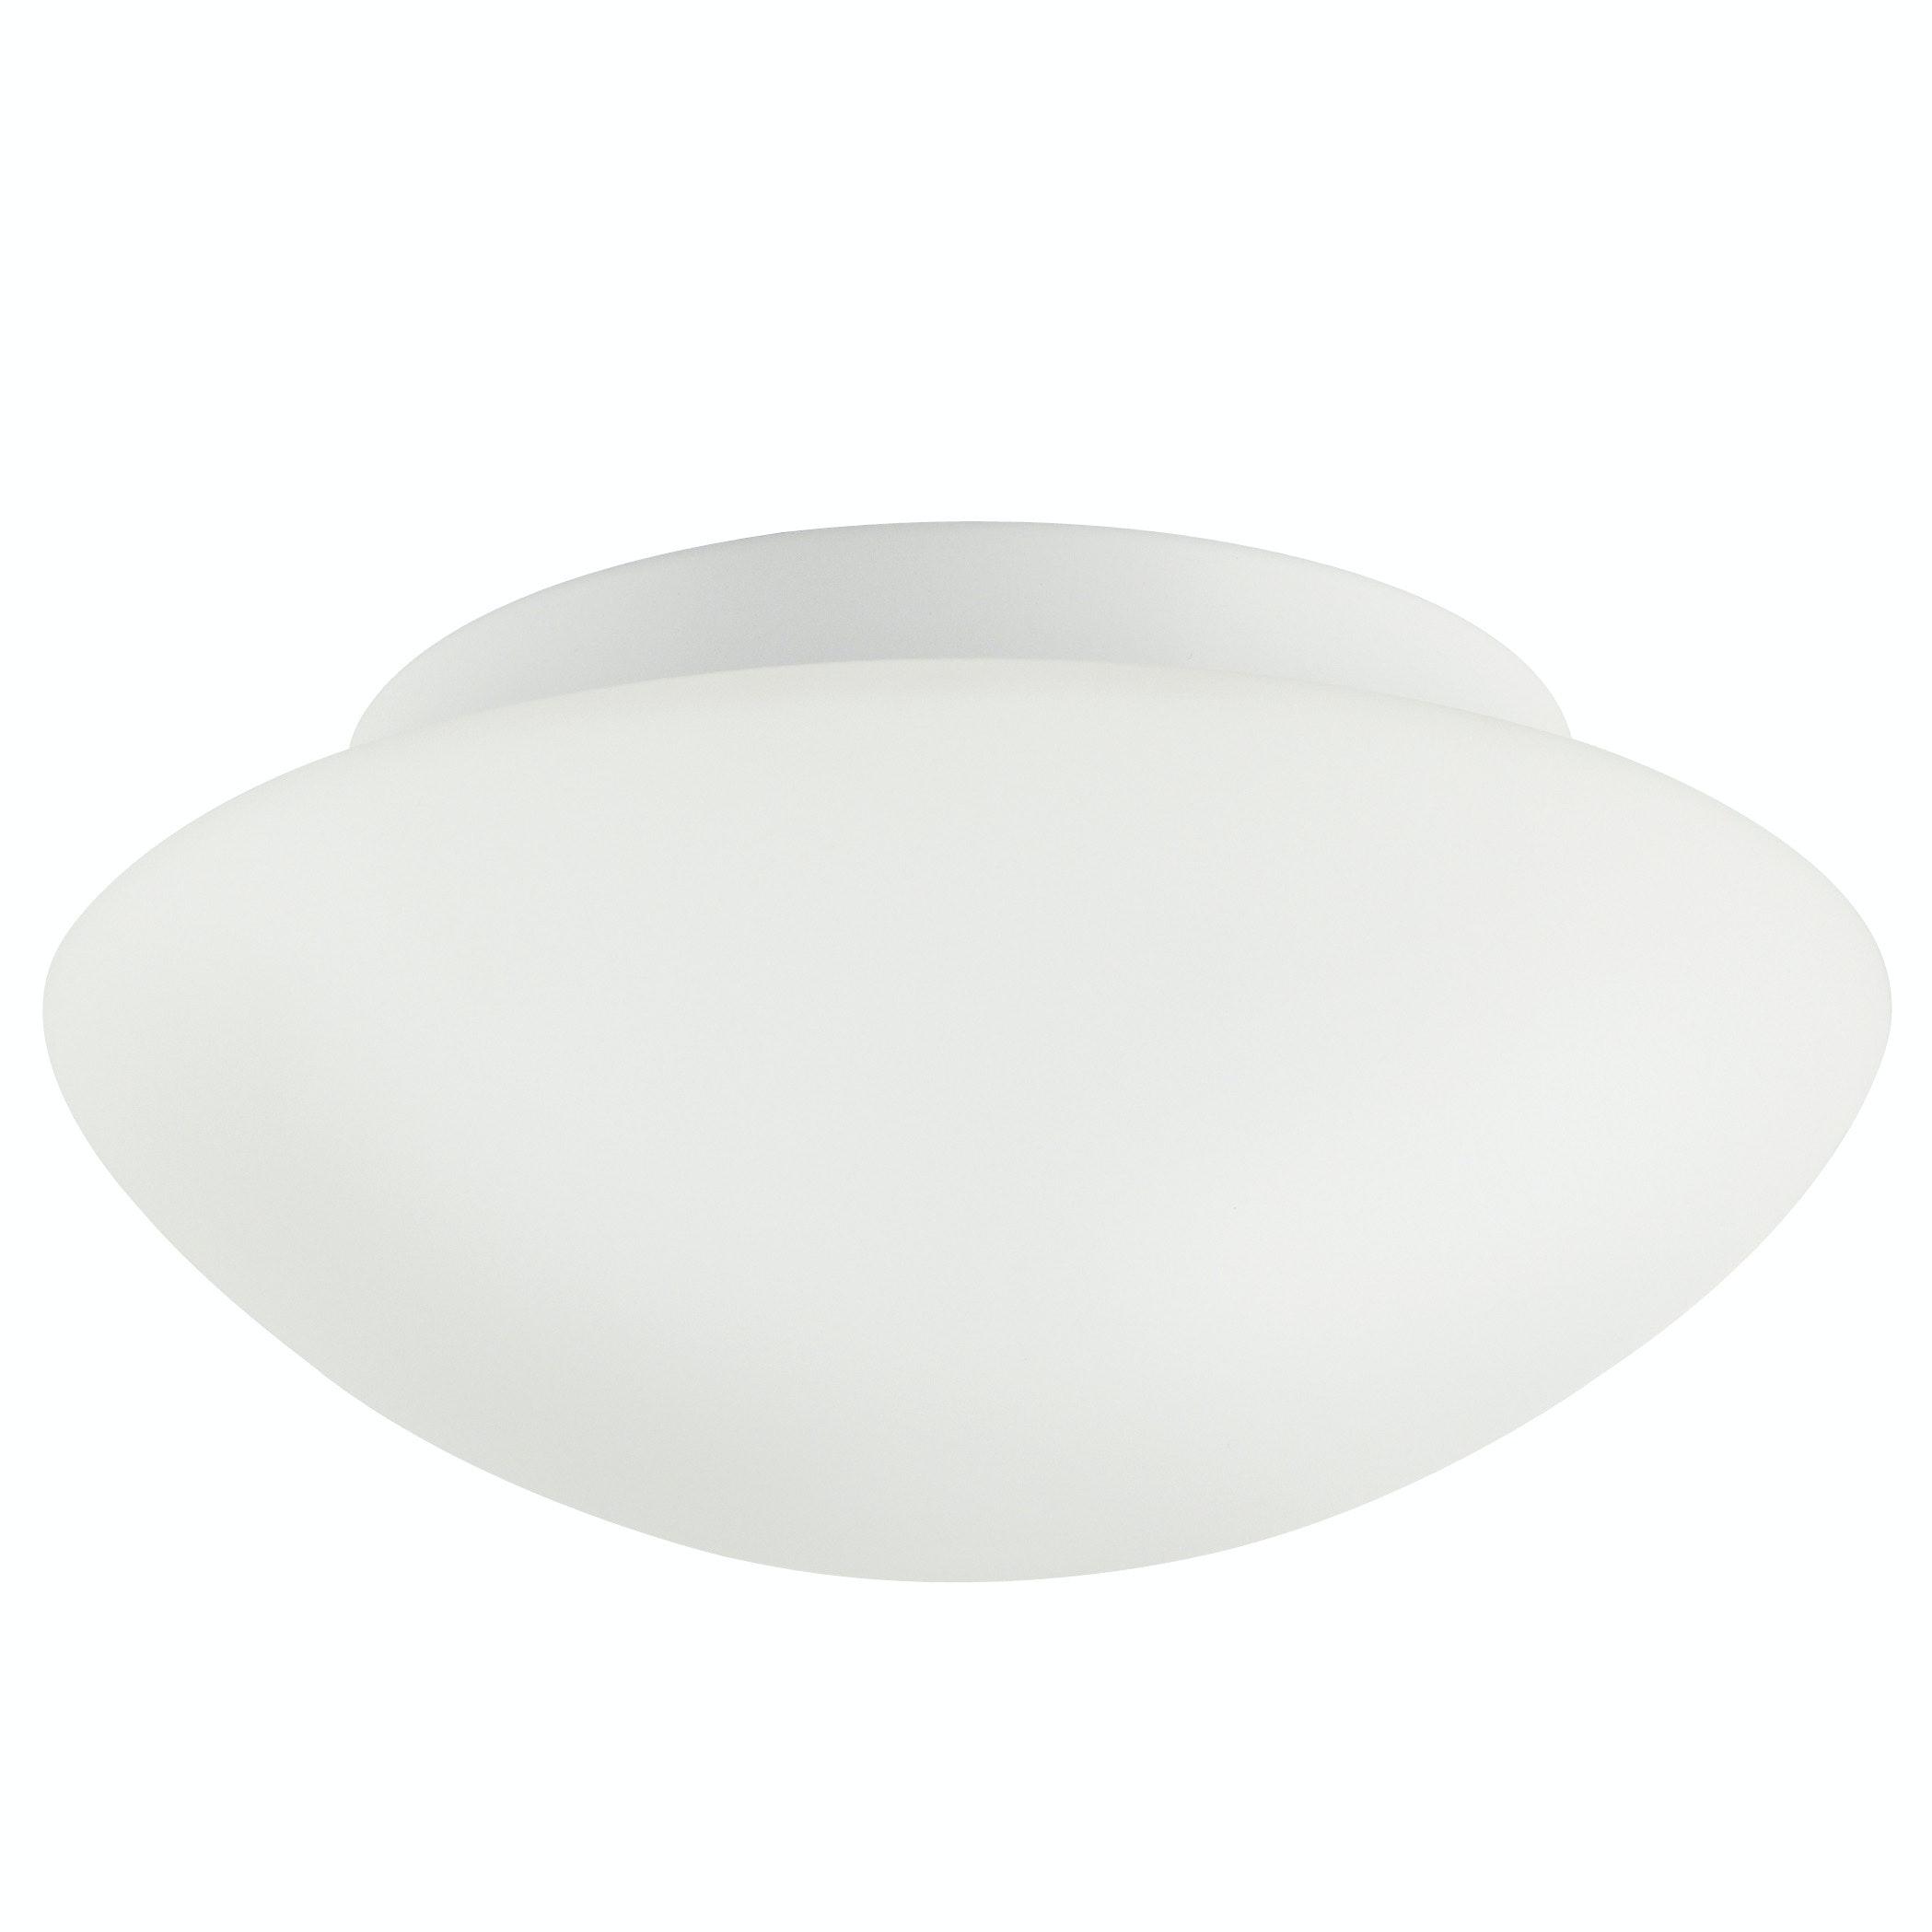 Plafond Nordlux Ufo Maxi E27 2x40W Ej Dimbar Vit